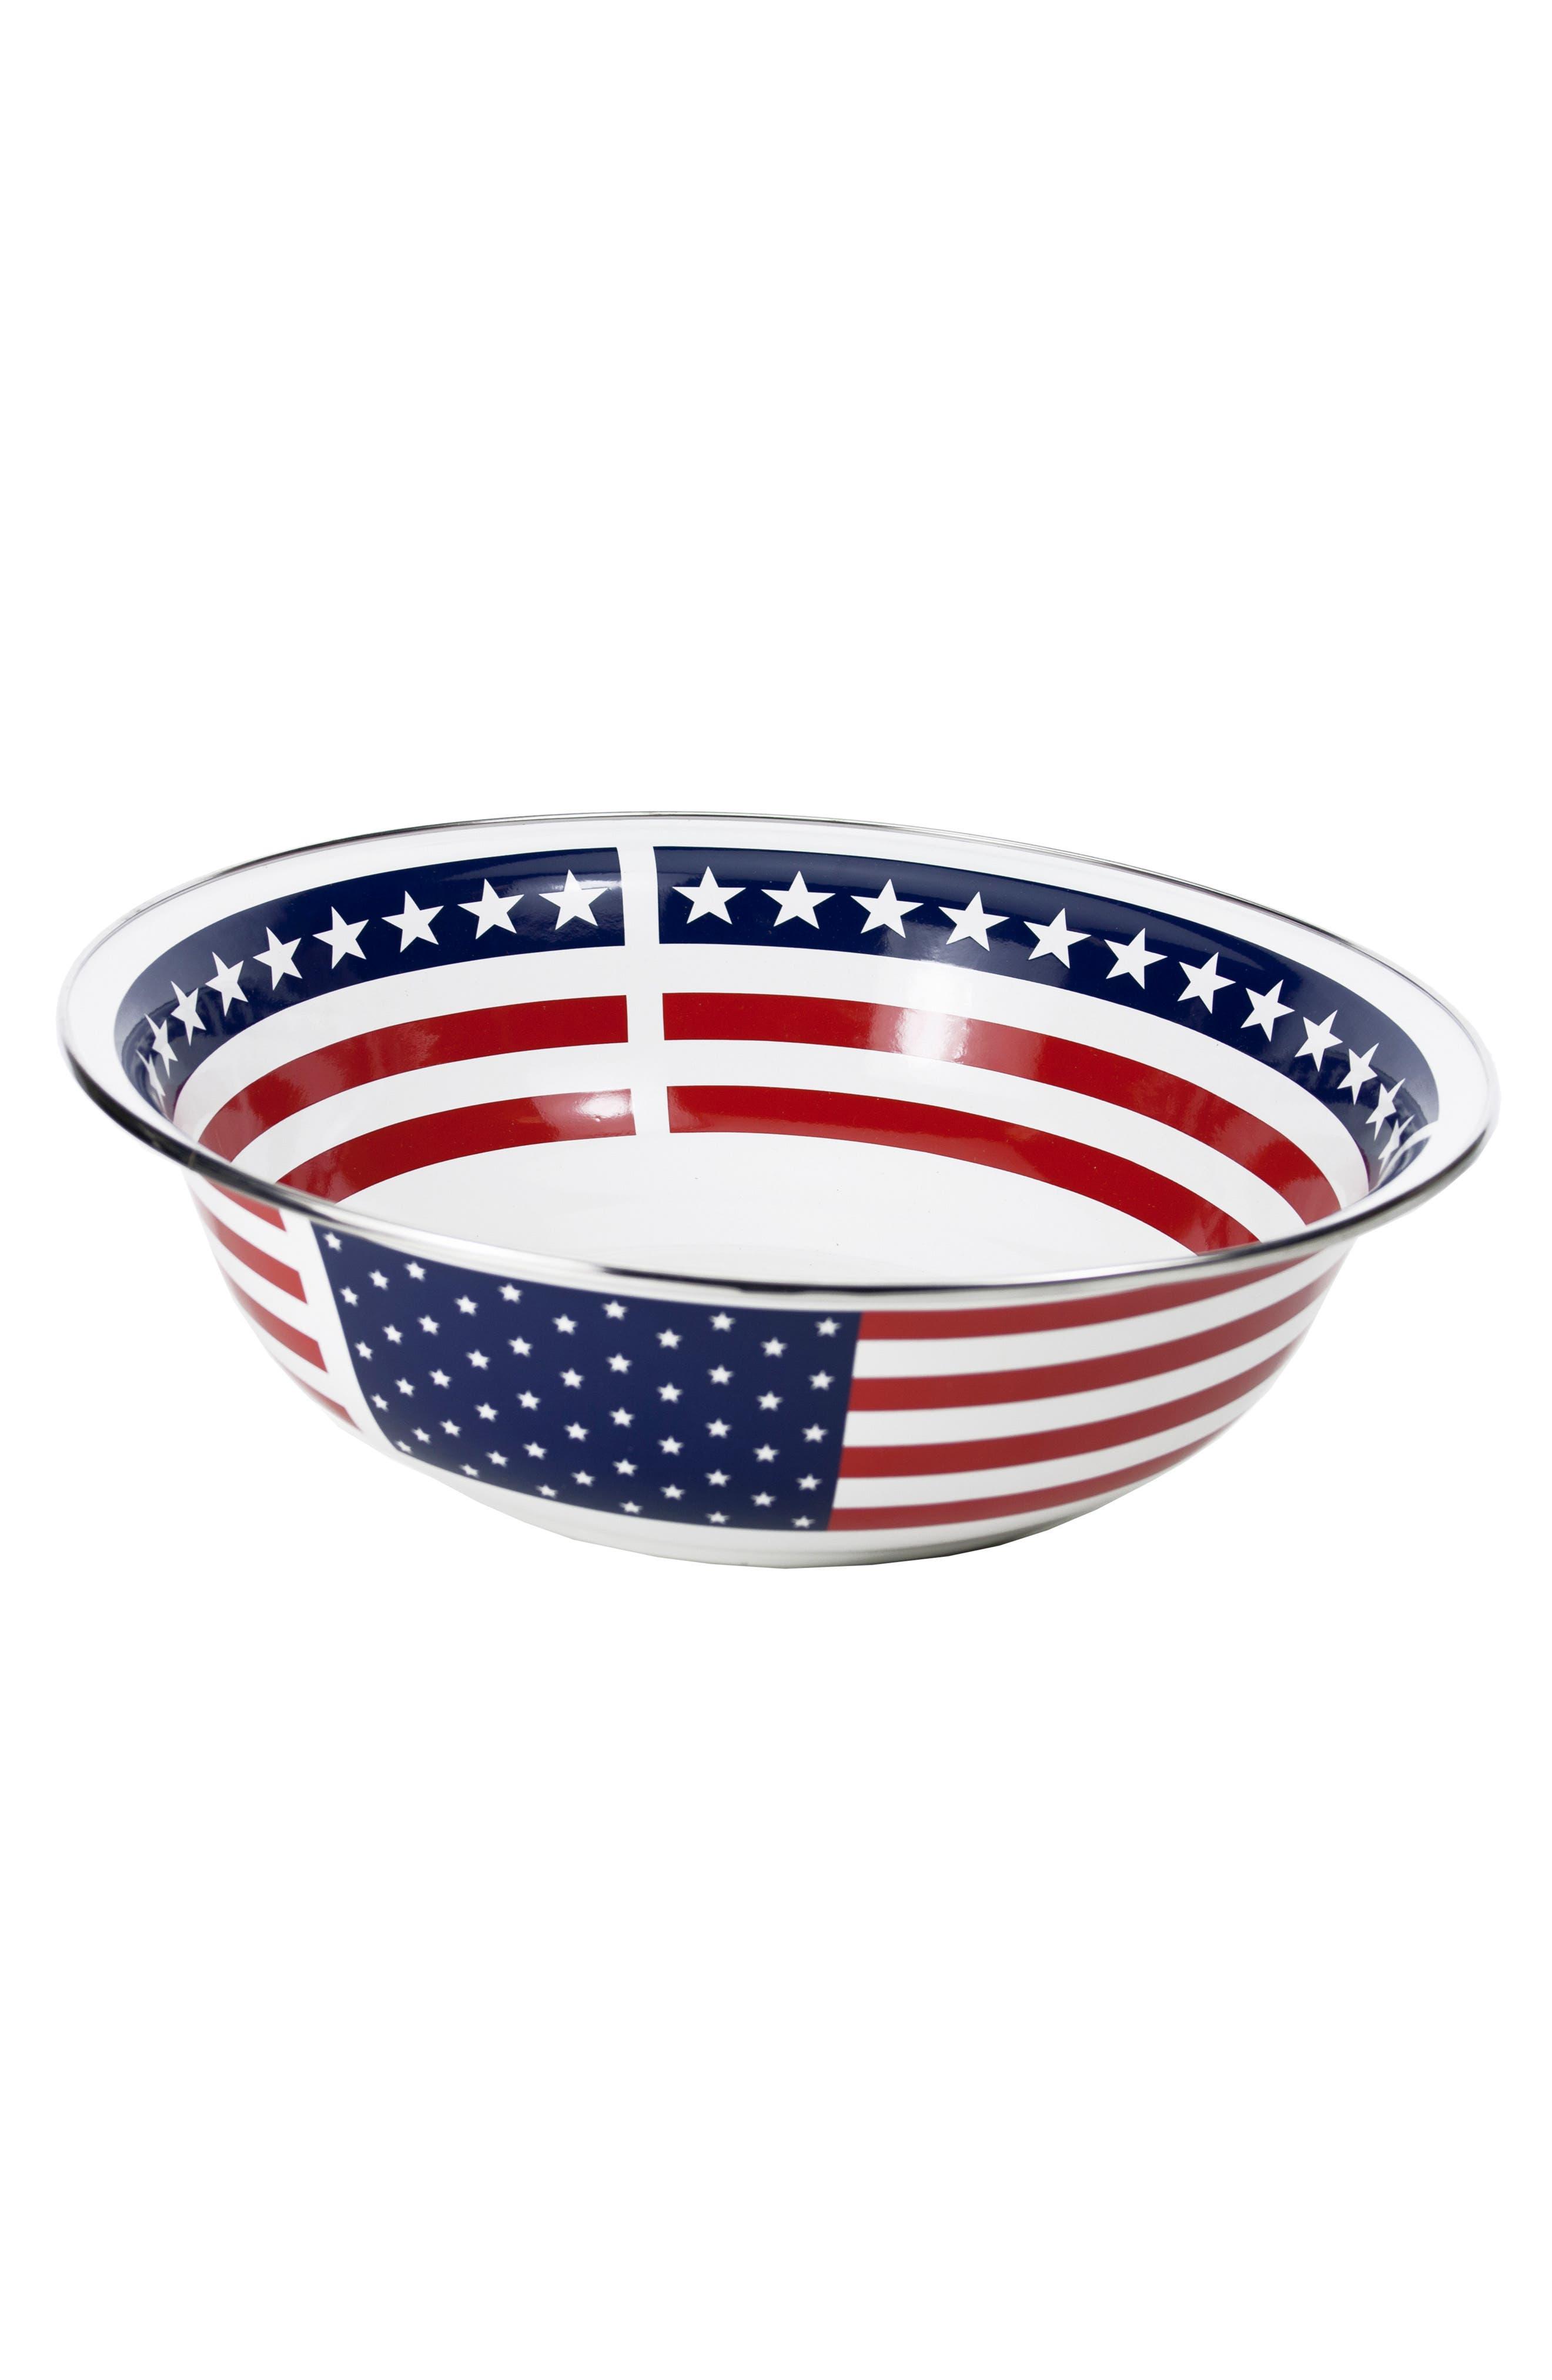 Stars & Stripes Serving Bowl,                         Main,                         color, Stars And Stripes